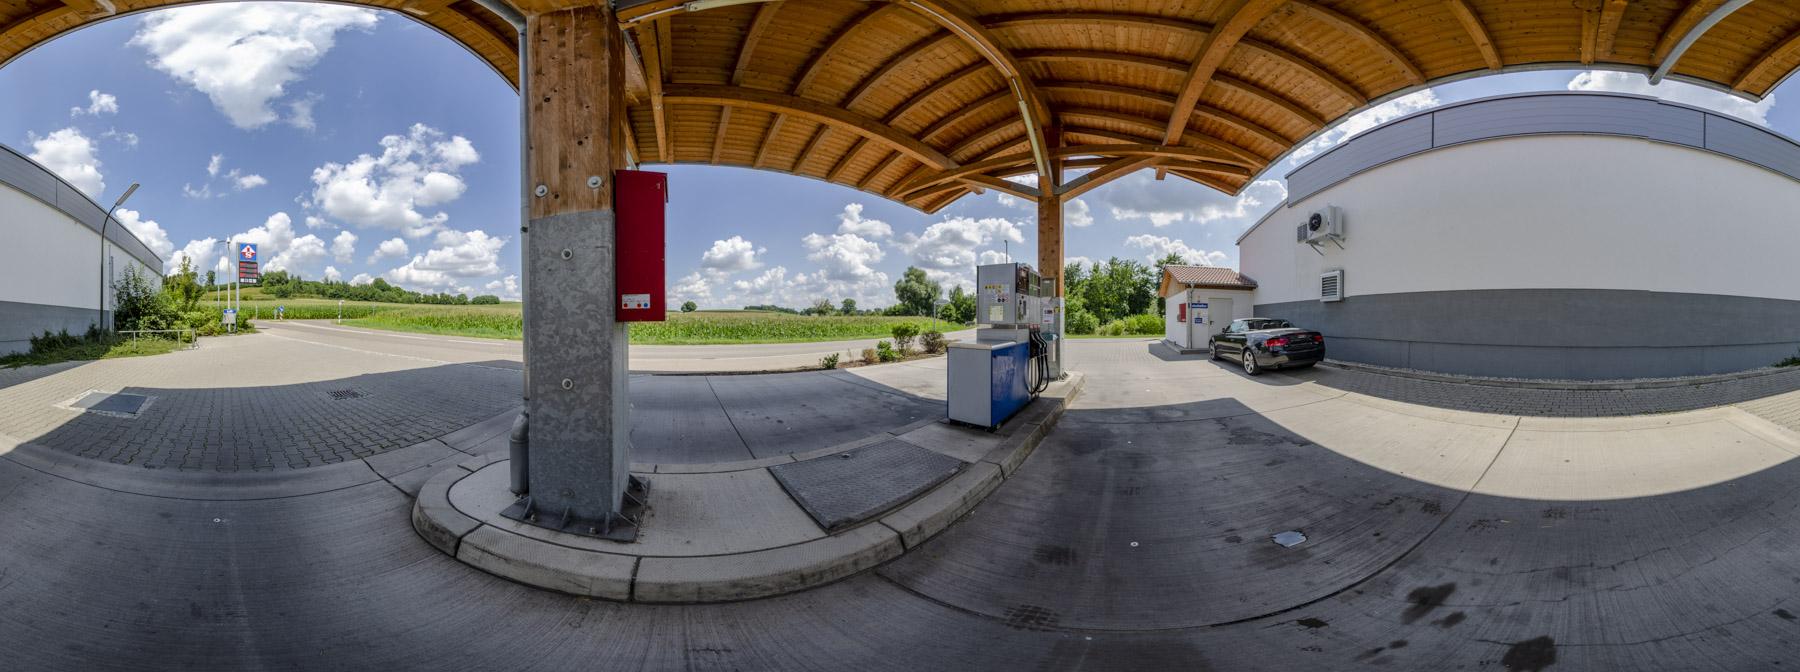 Tankstelle Aindling 360°